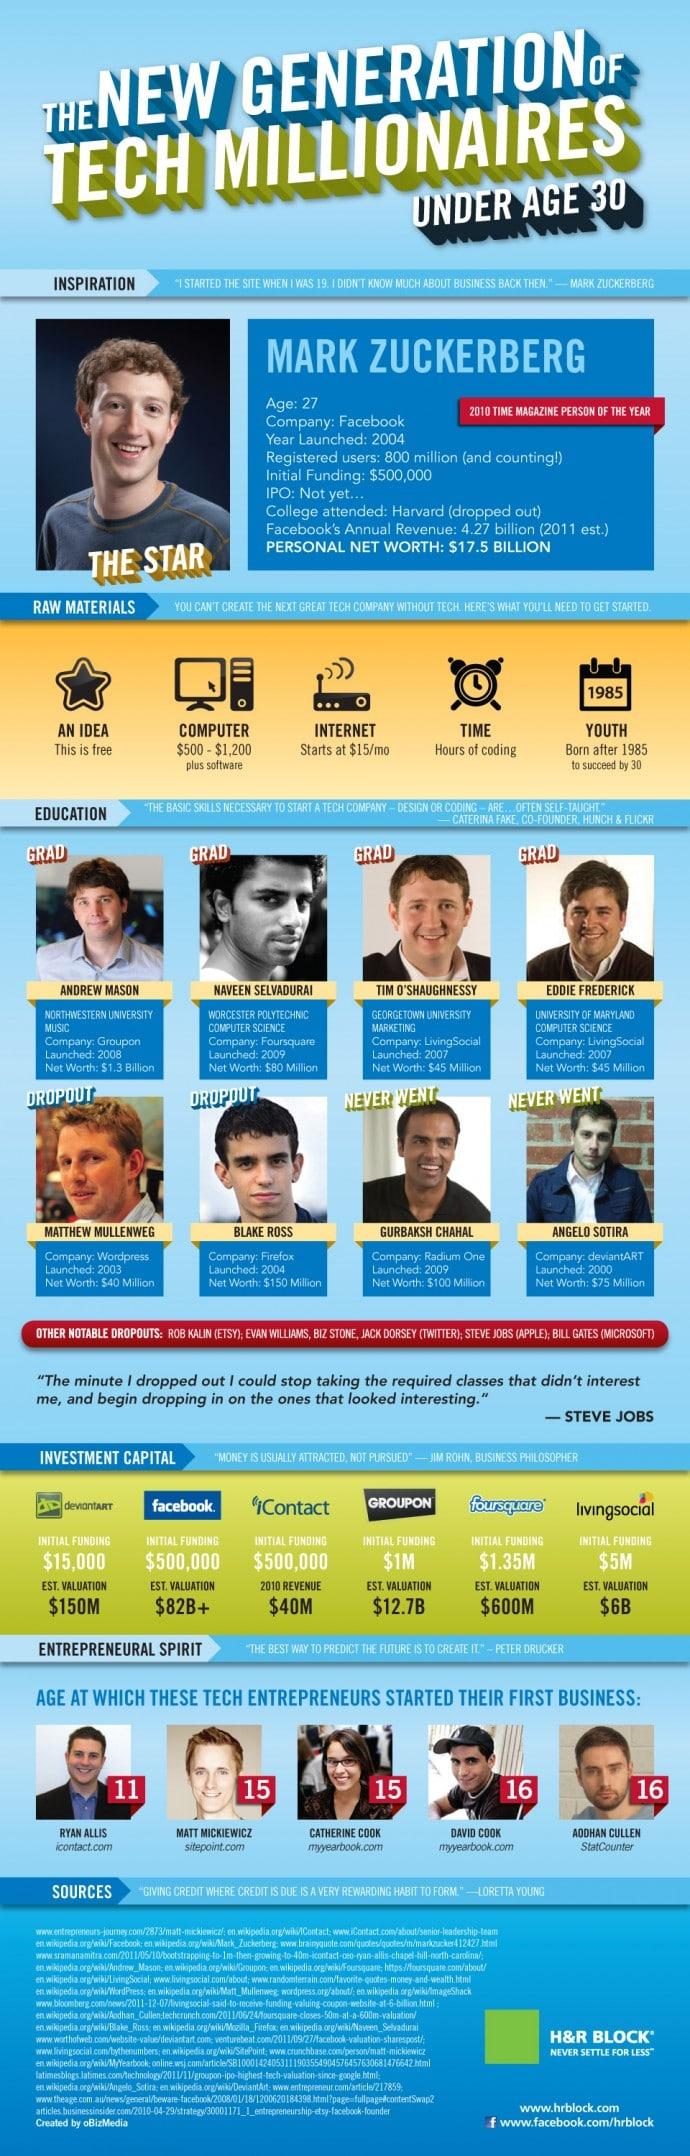 tech-millionaires-under-30-infographic